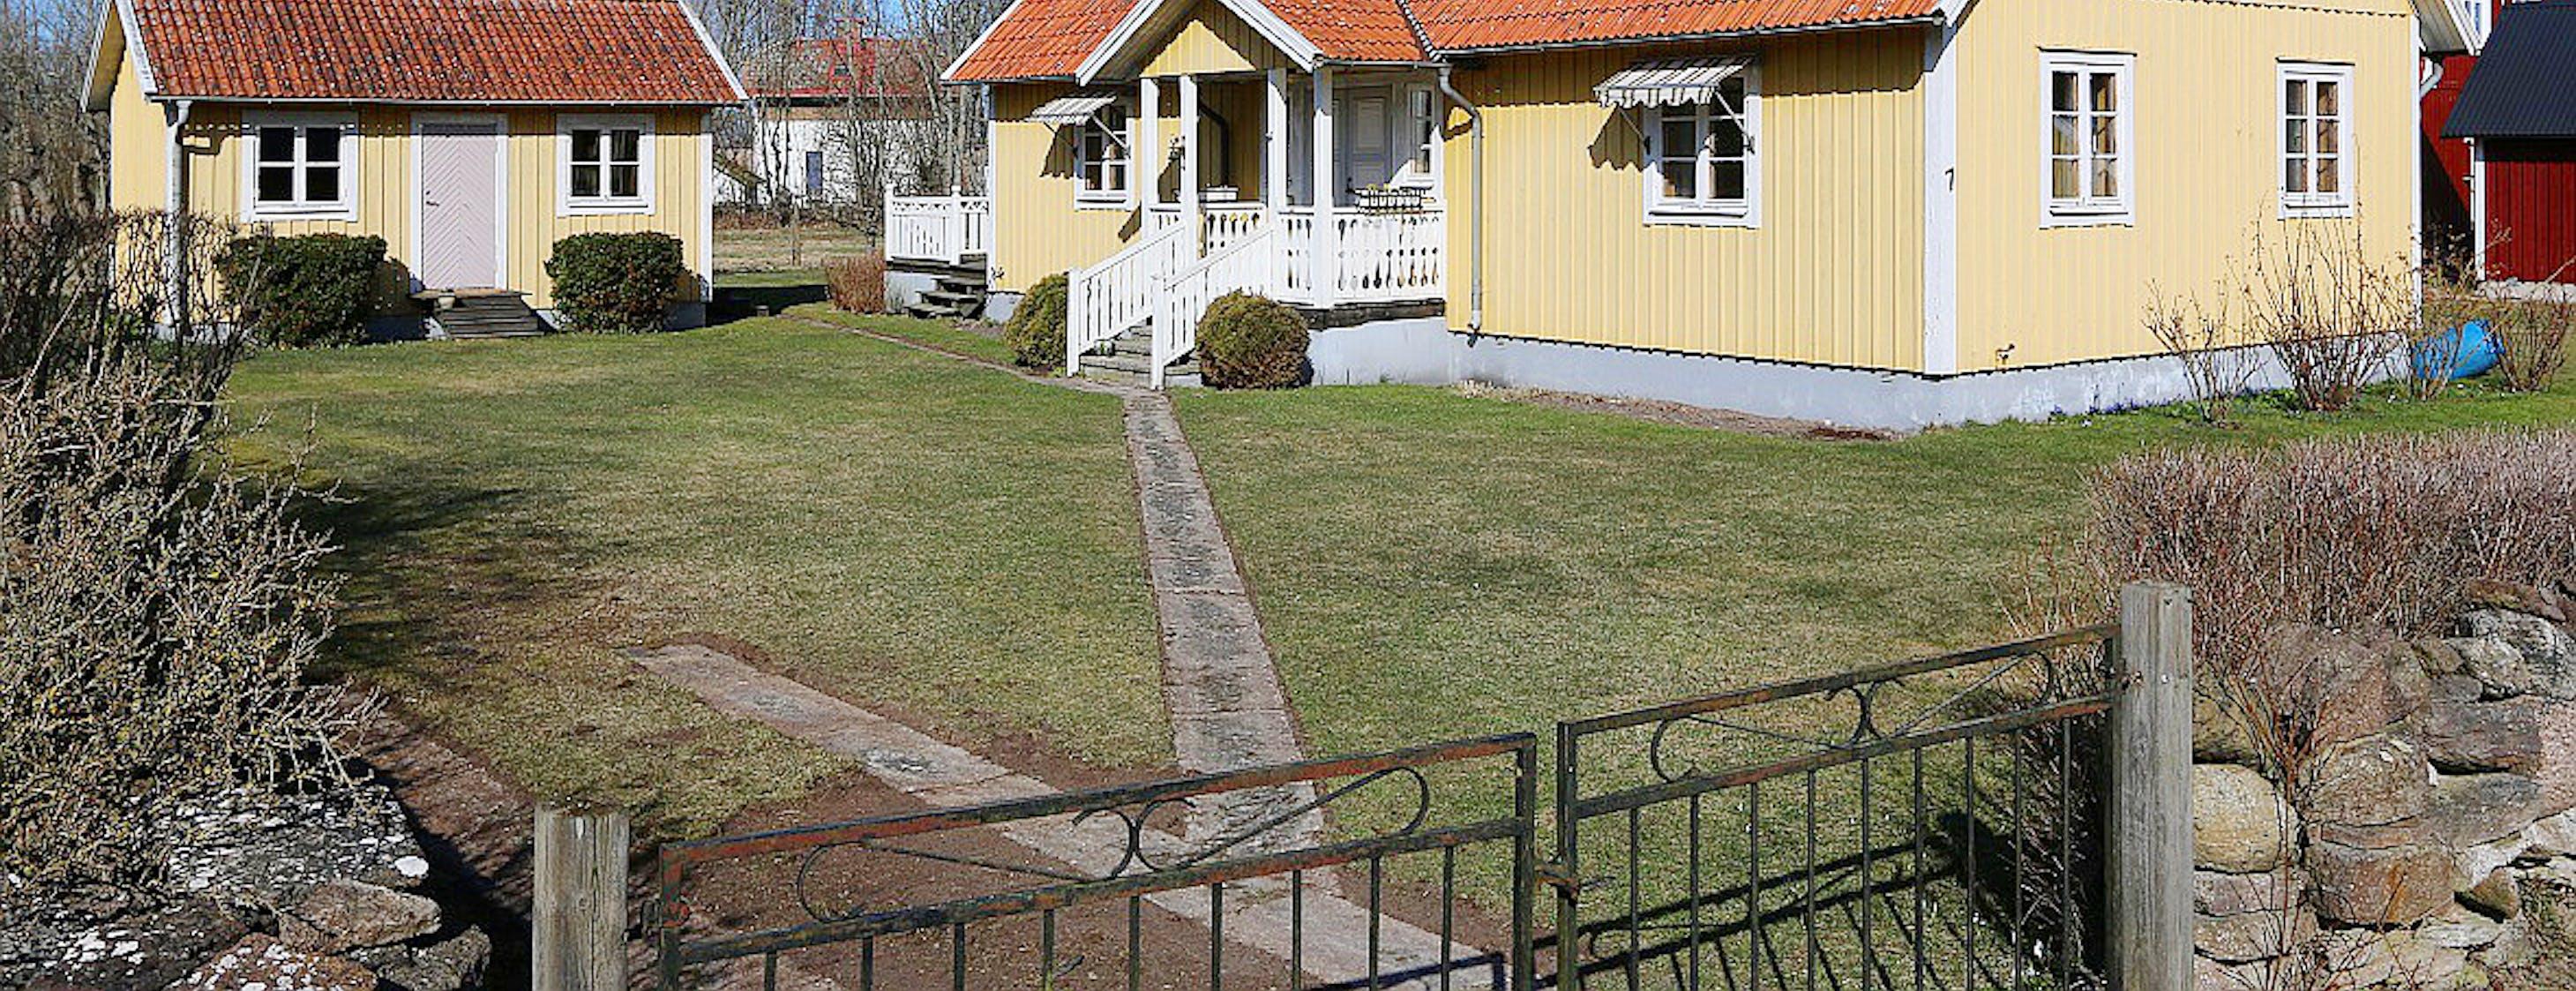 Lilla Gatan 7 Södvik